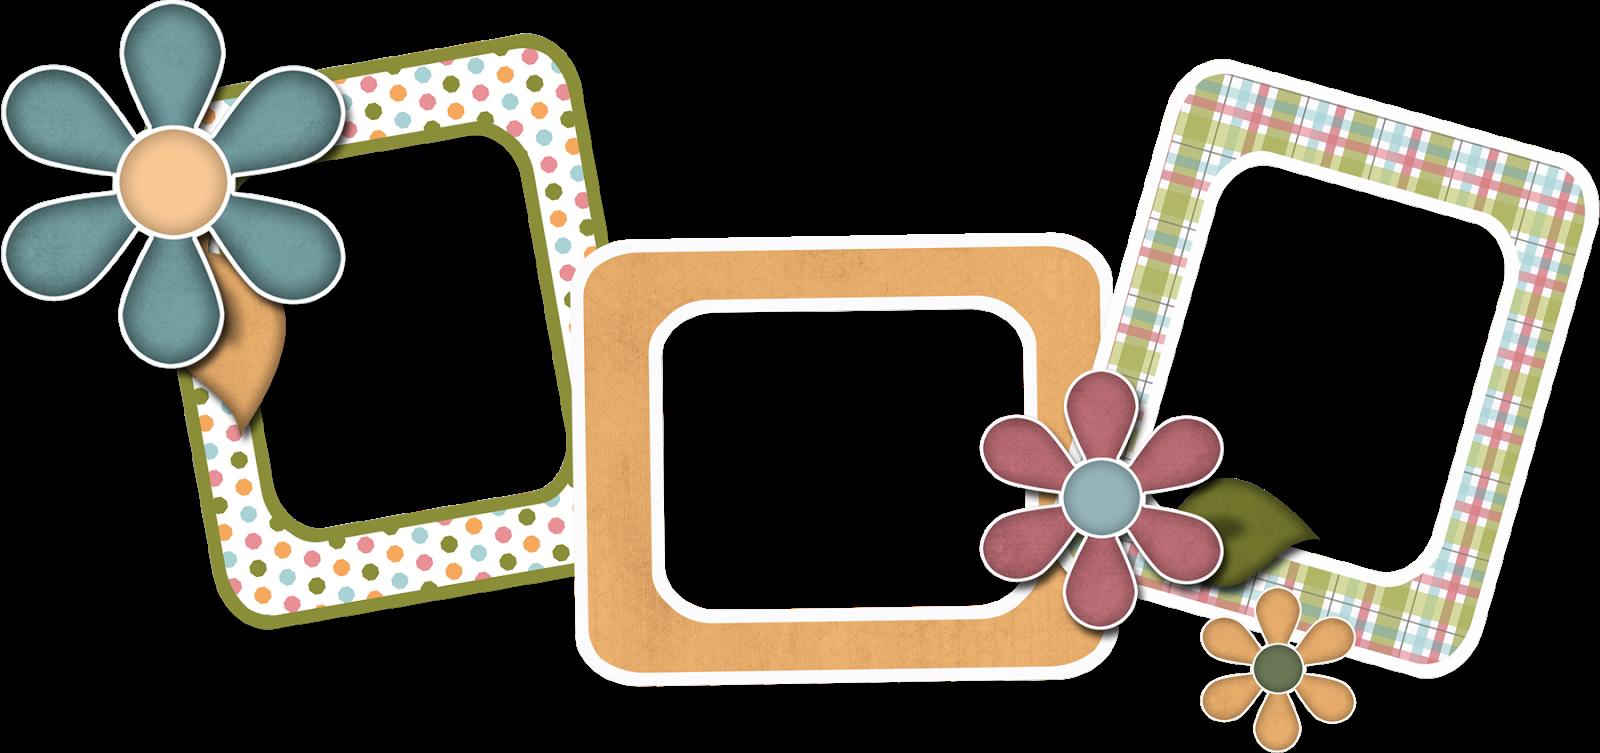 Free Scrapbooking Frames | Free Digital Scrapbook Elements ...